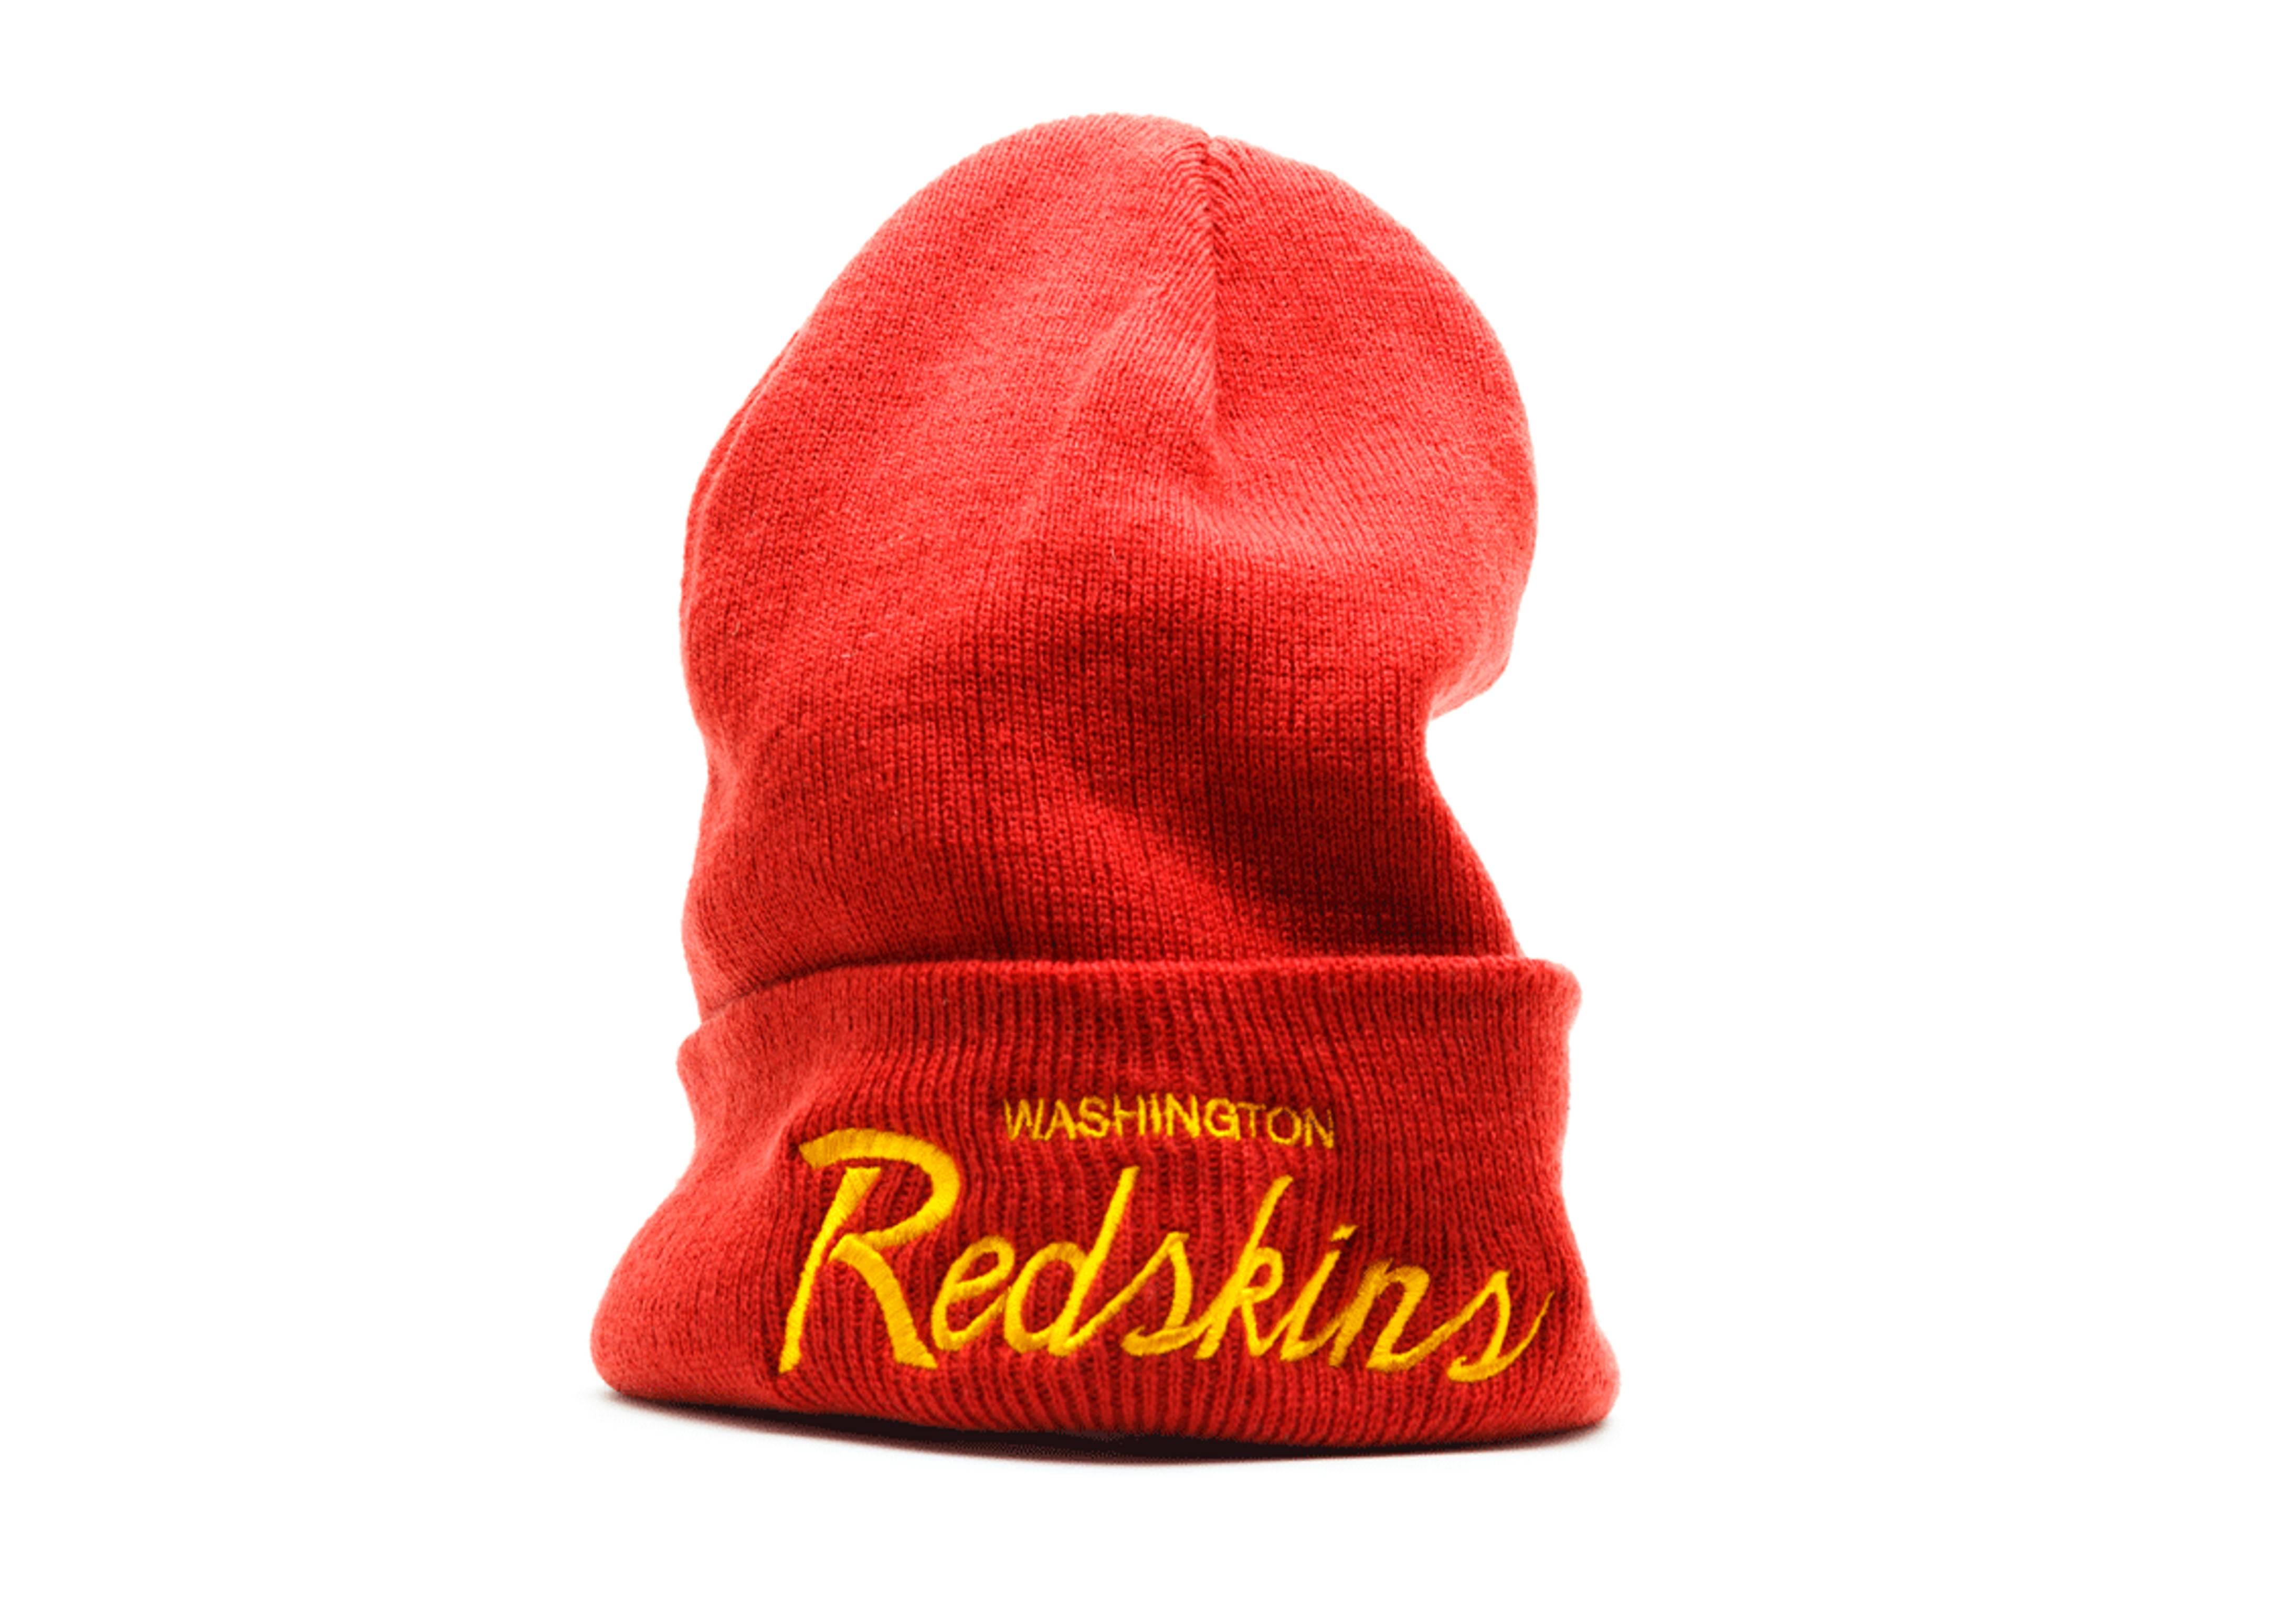 washington redskins cuffed knit beanie